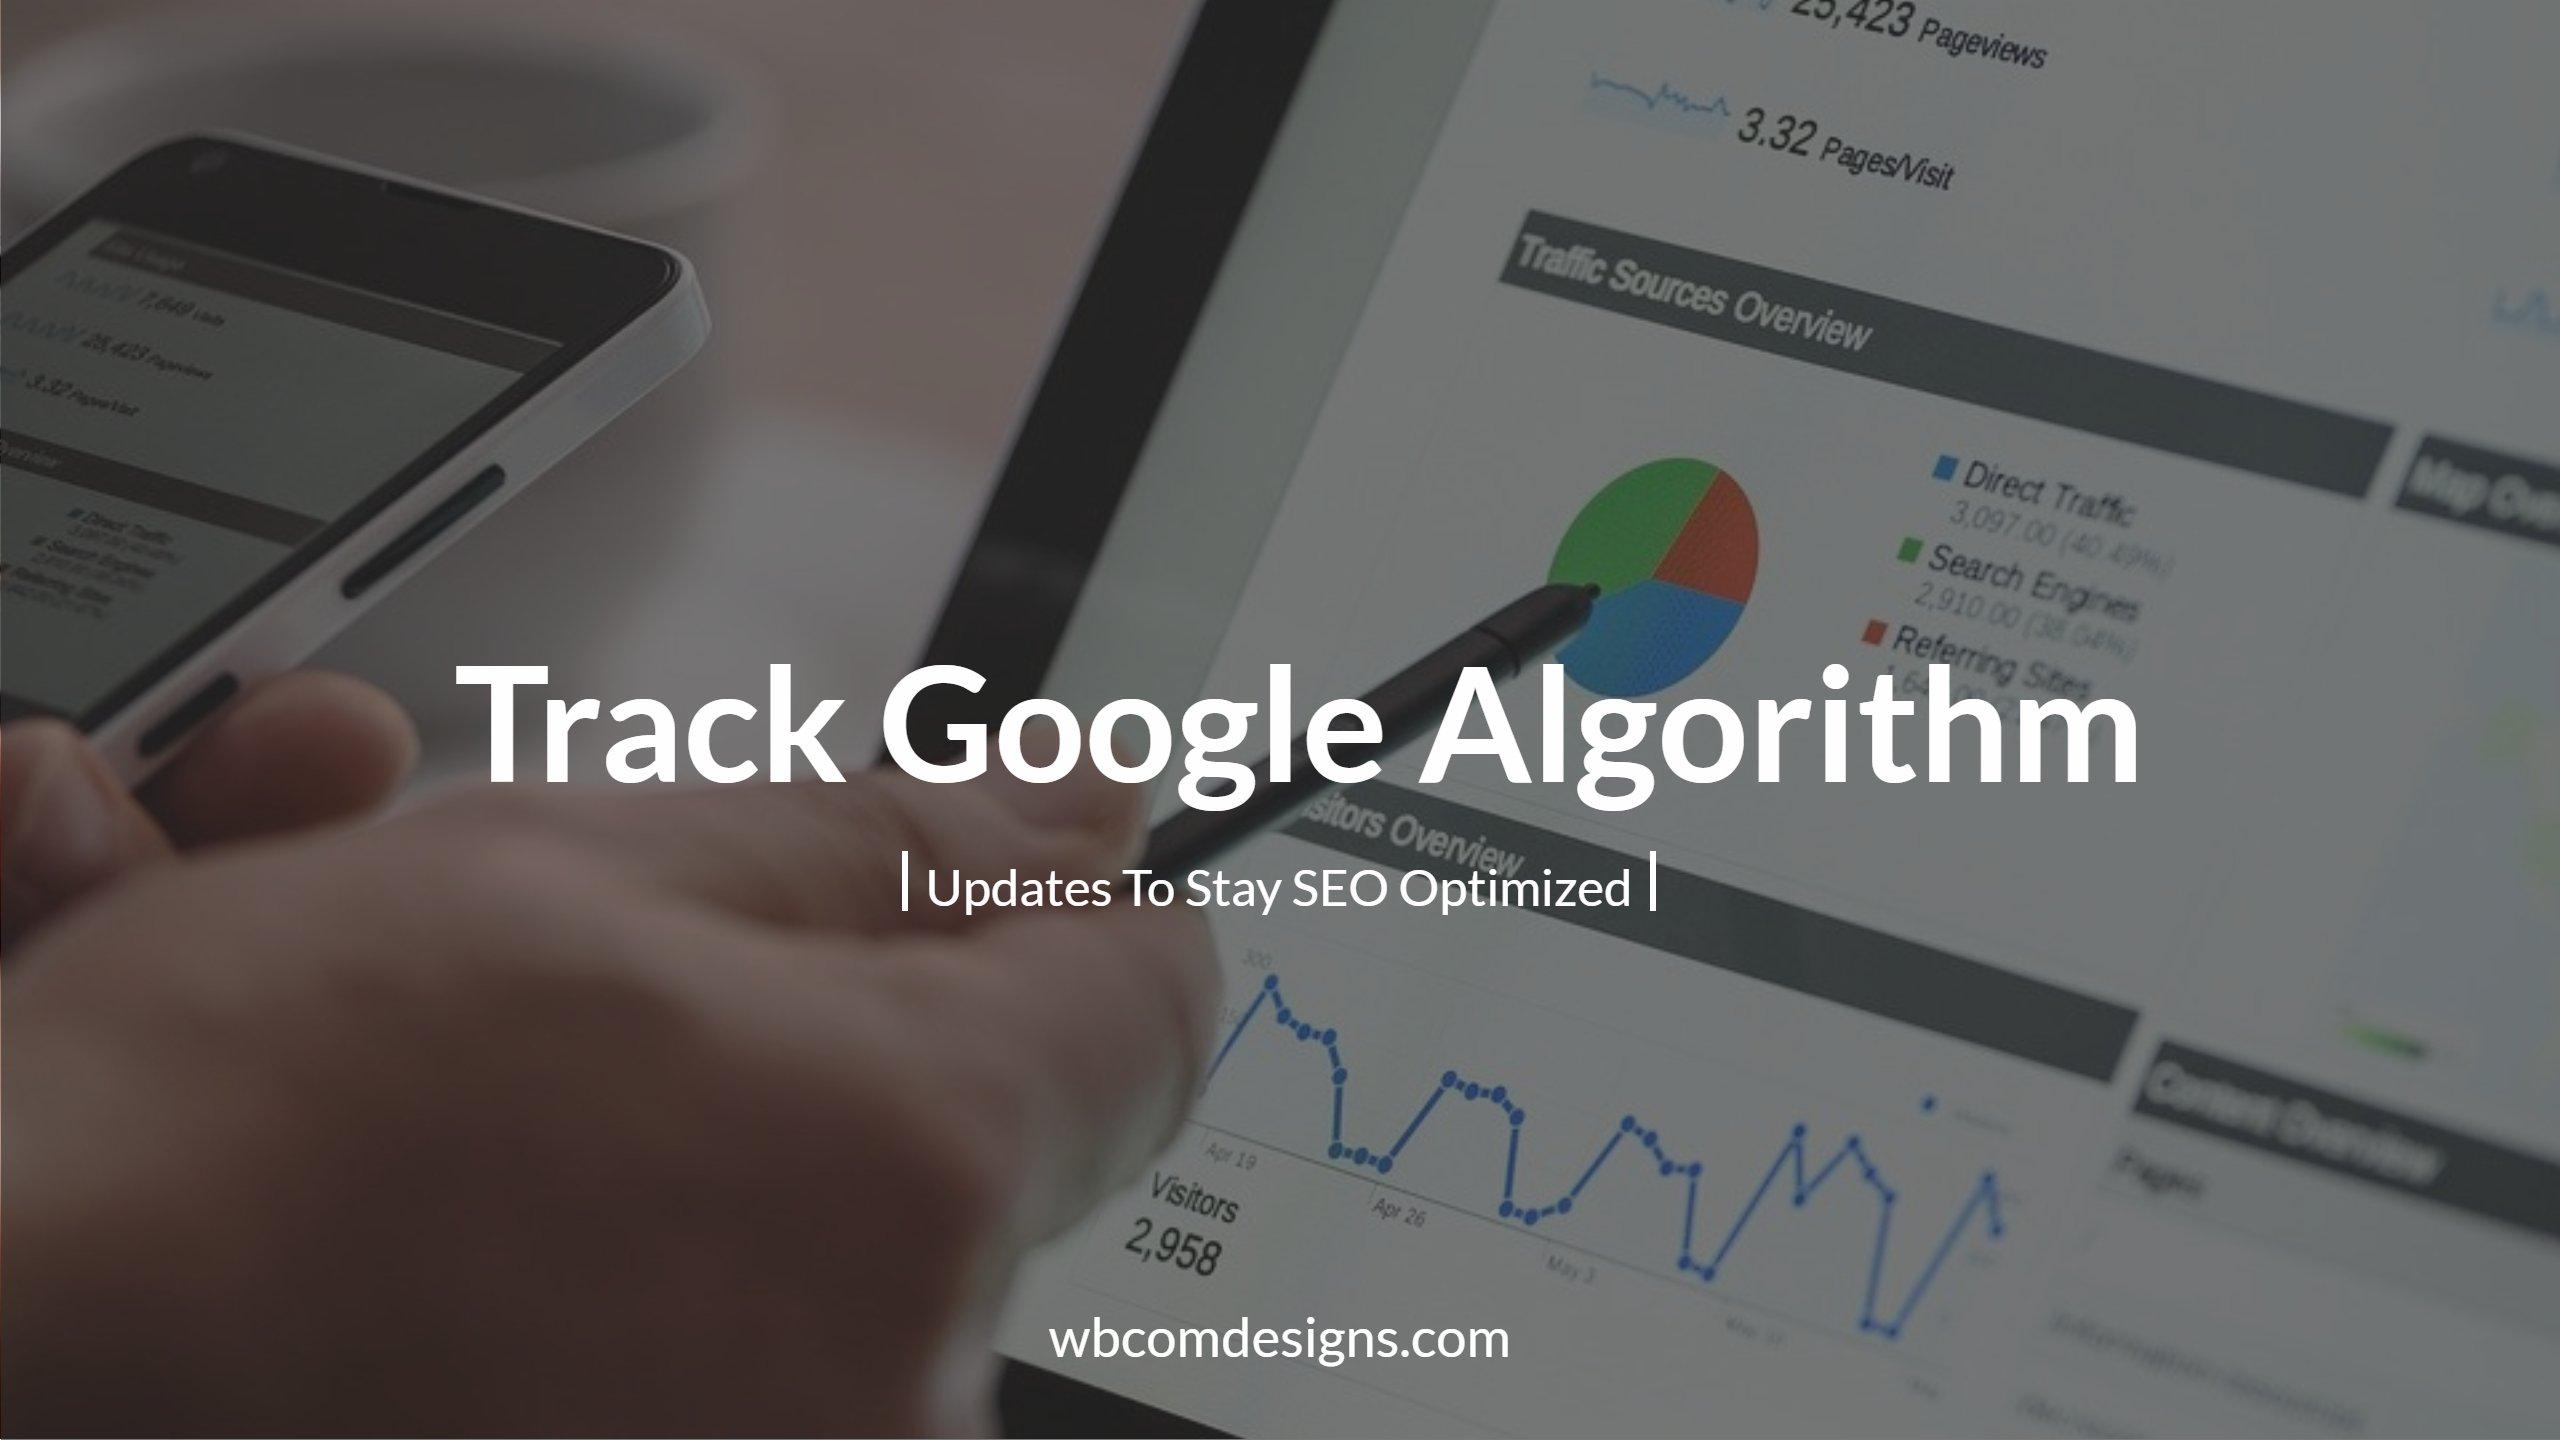 Track Google Algorithm